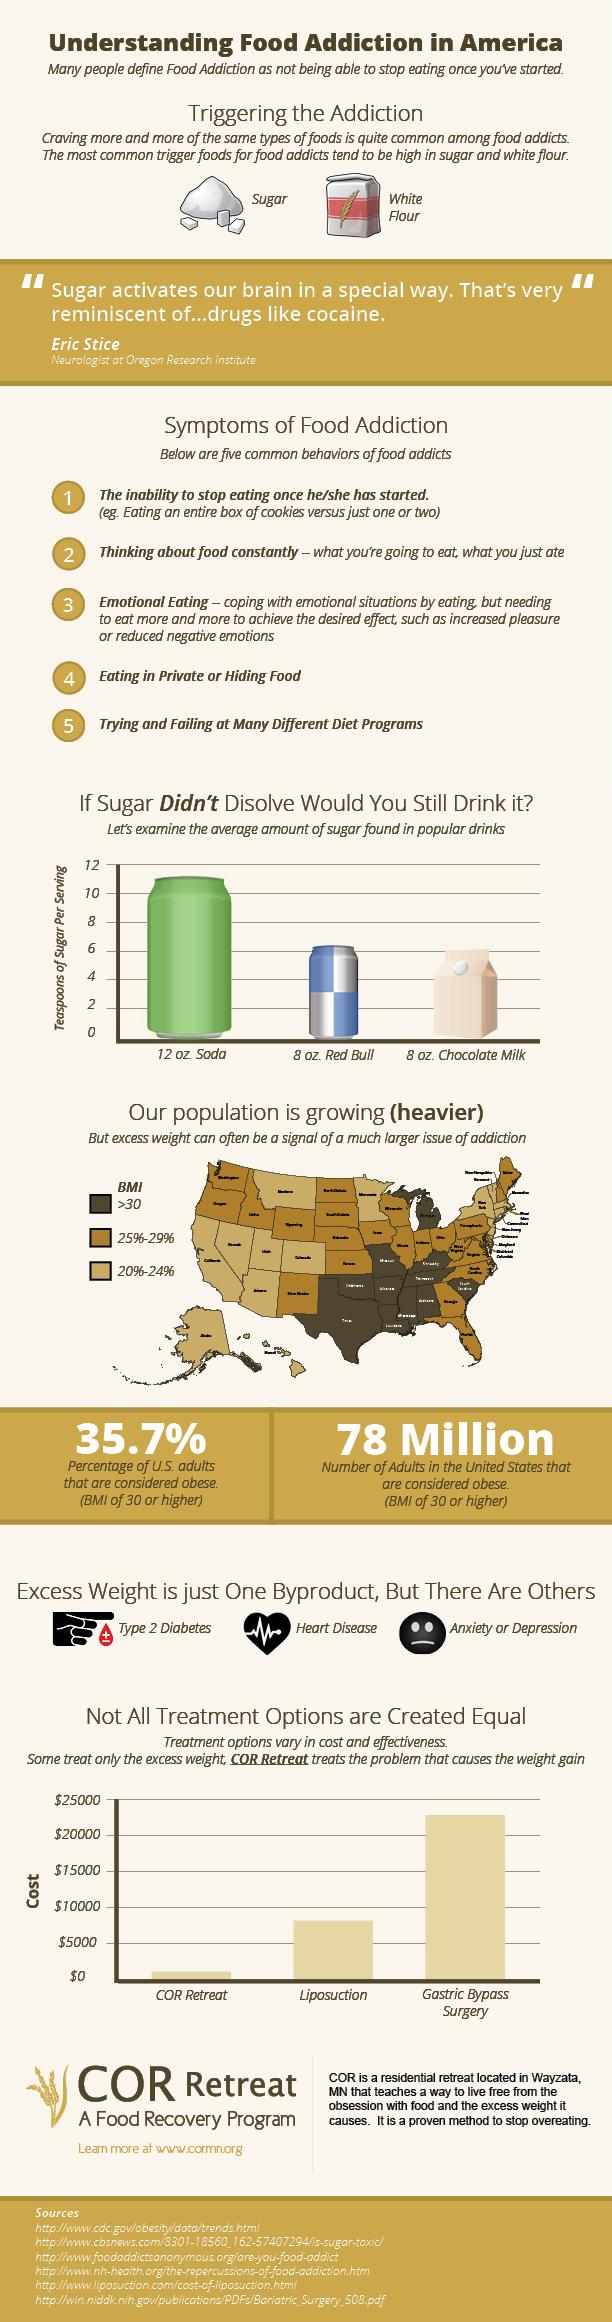 Understanding-Food-Addiction-In-America-infographic